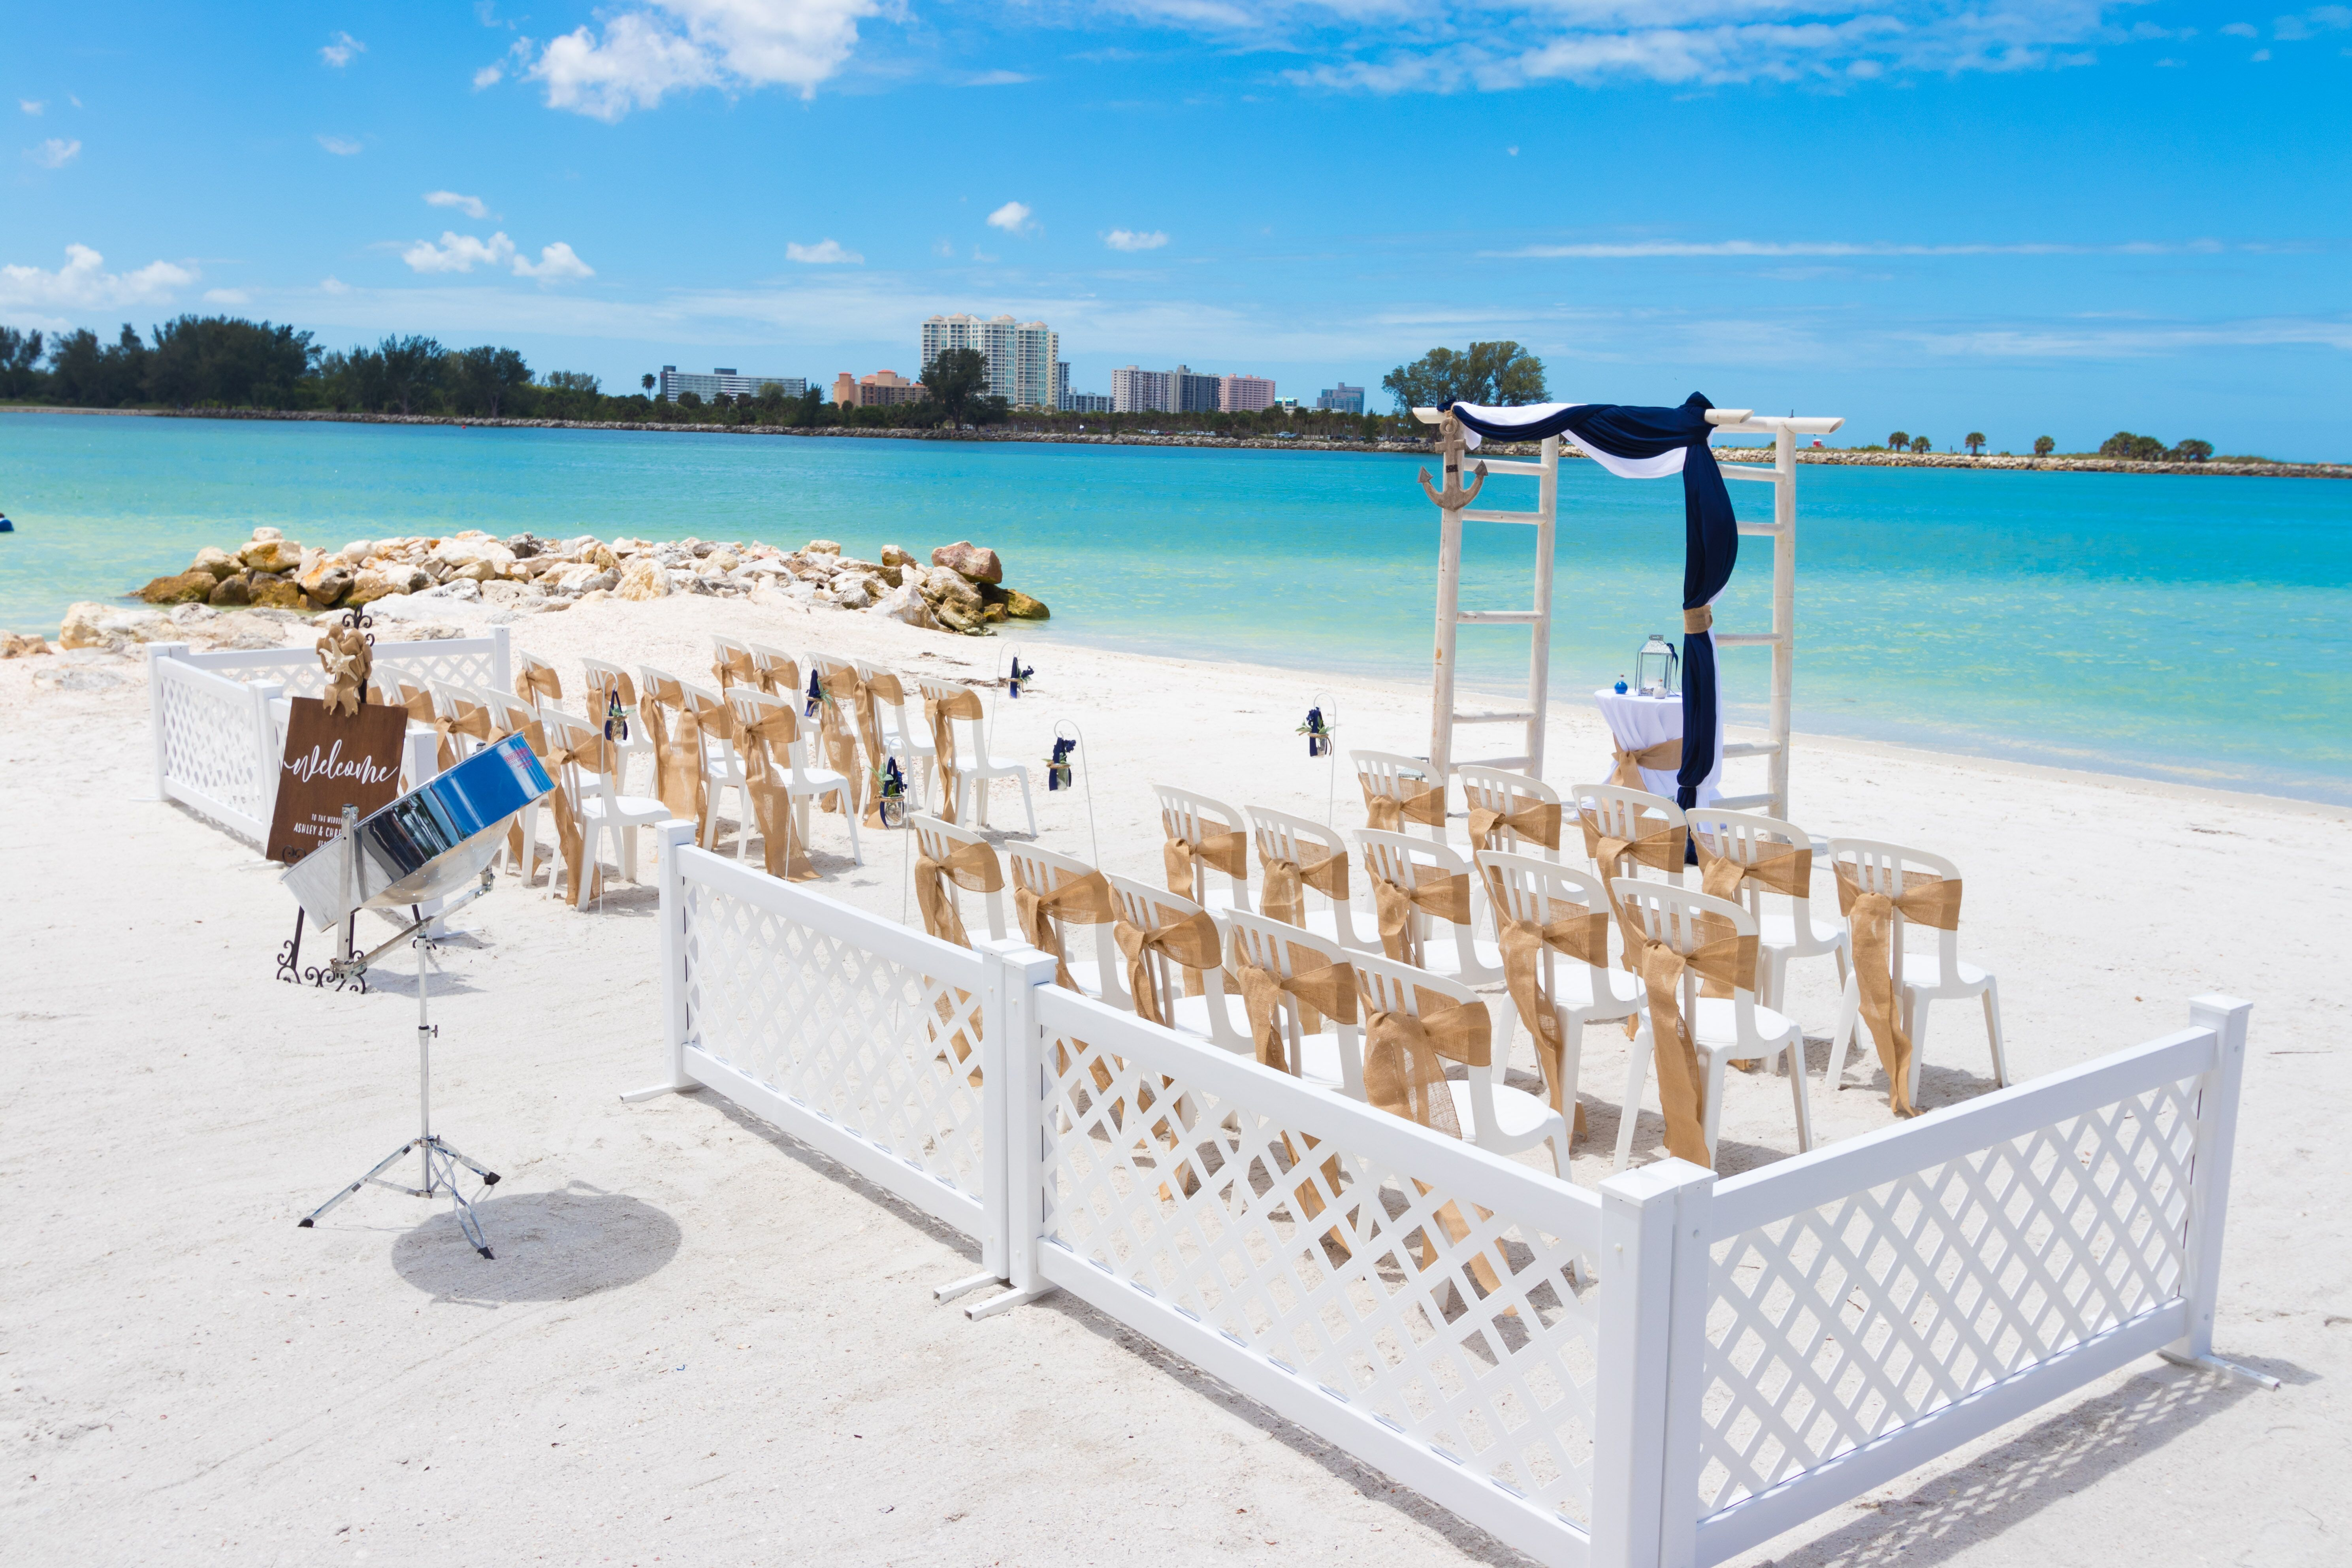 Shephards Beach Resort Clearwater Beach Fl